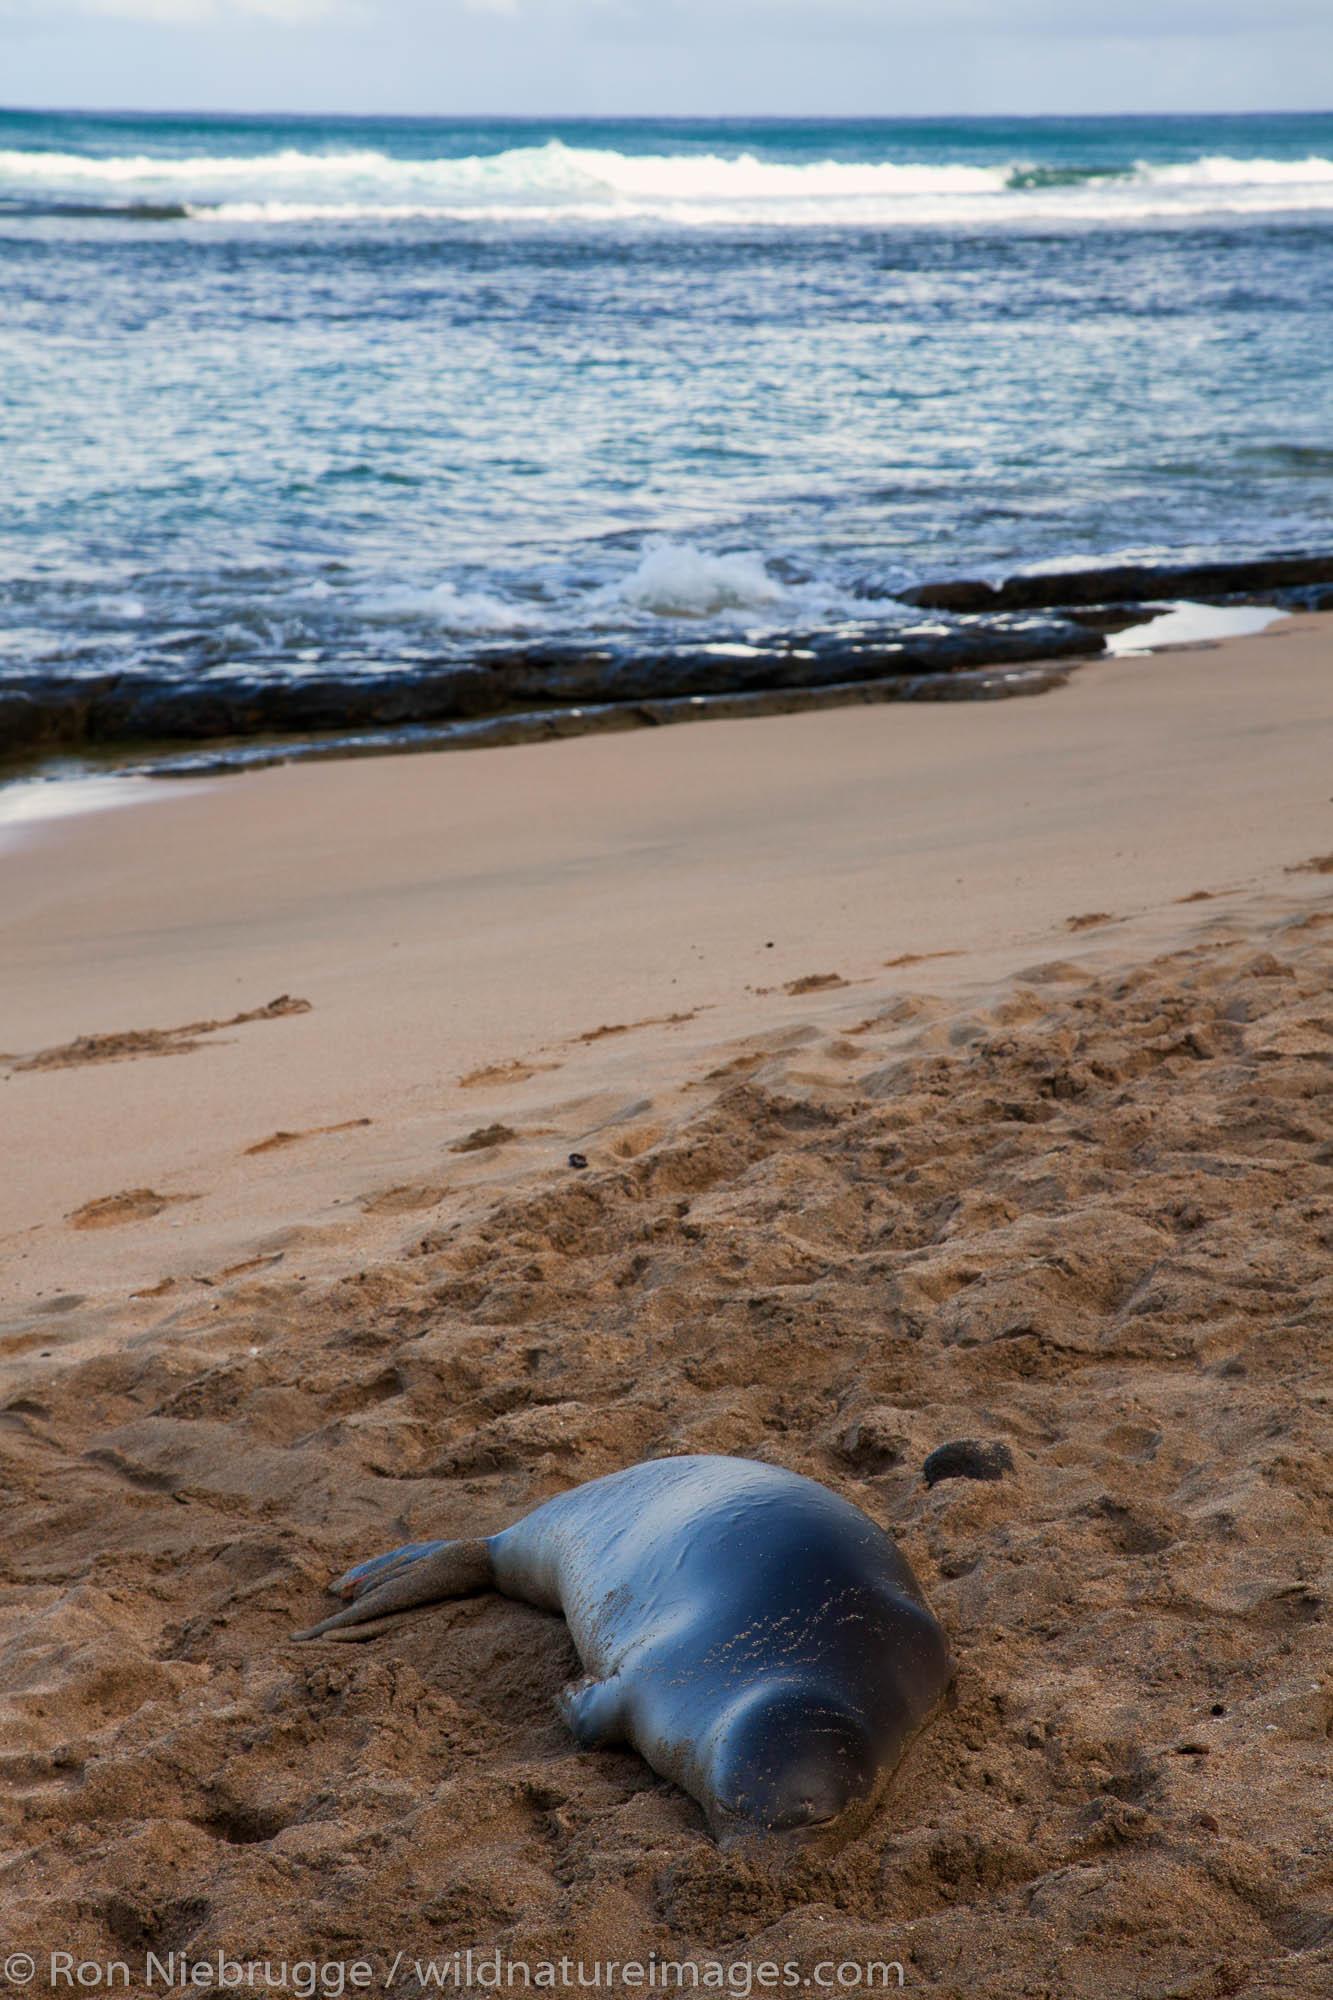 Hawaiian monk seal on Ke'e Beach at the beginning of the Na Pali Coast, Kauai, Hawaii.